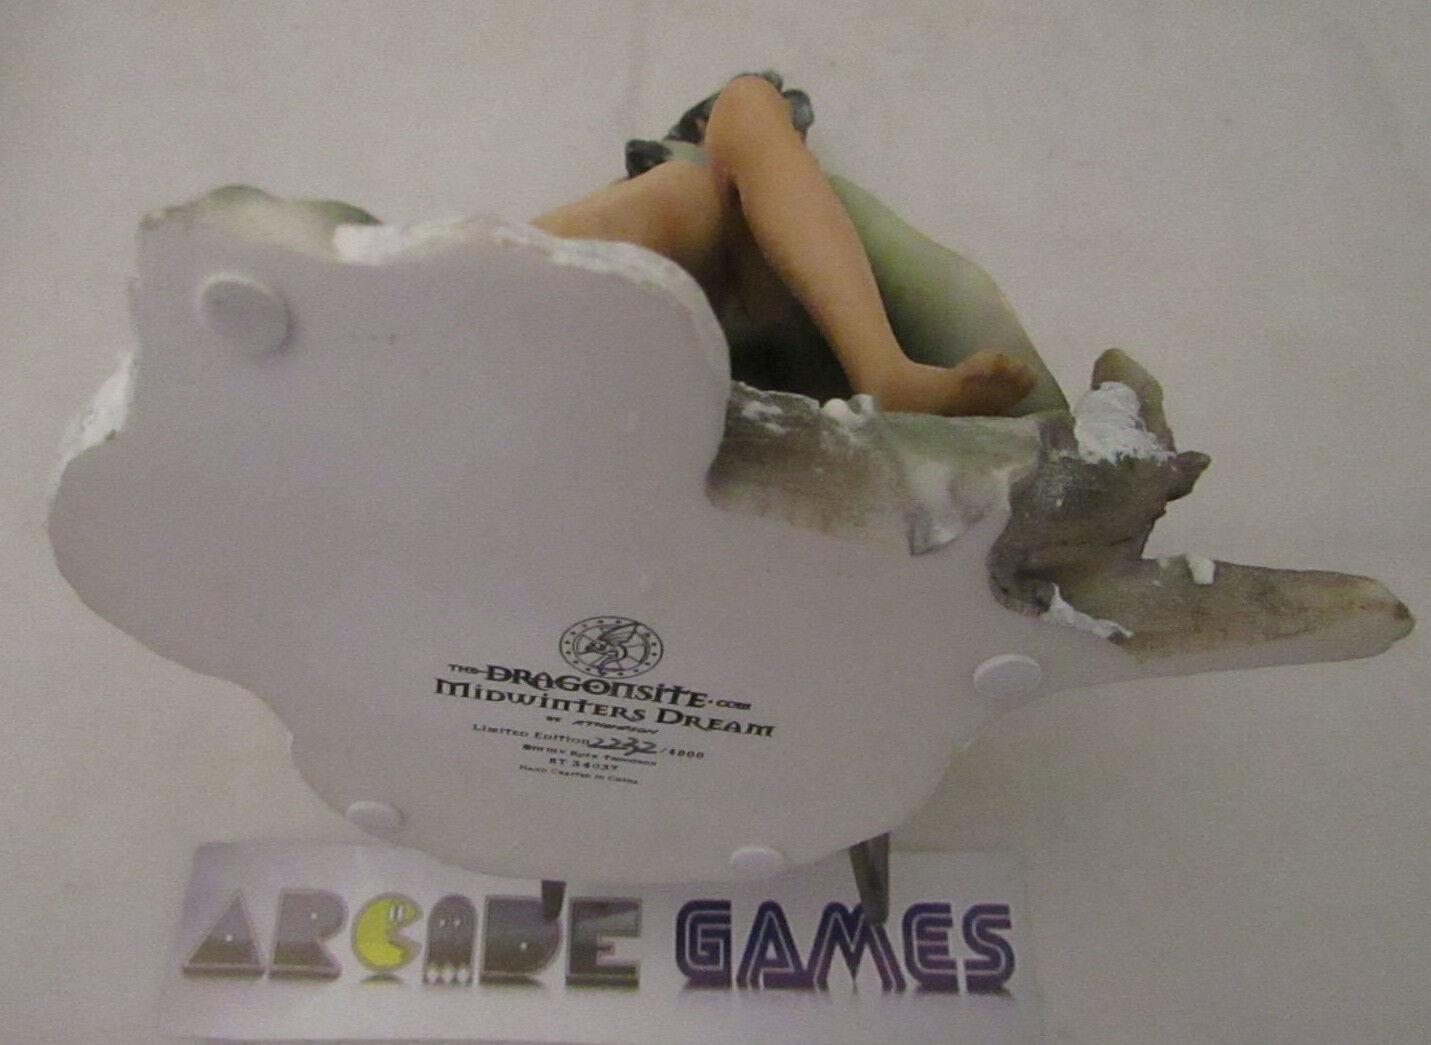 RUTH THOMPSON MIDWINTERS DREAM - FIGURINE NEUVE DRAGONSITE + BOITE BOITE BOITE (vendeur pro) 7e708f